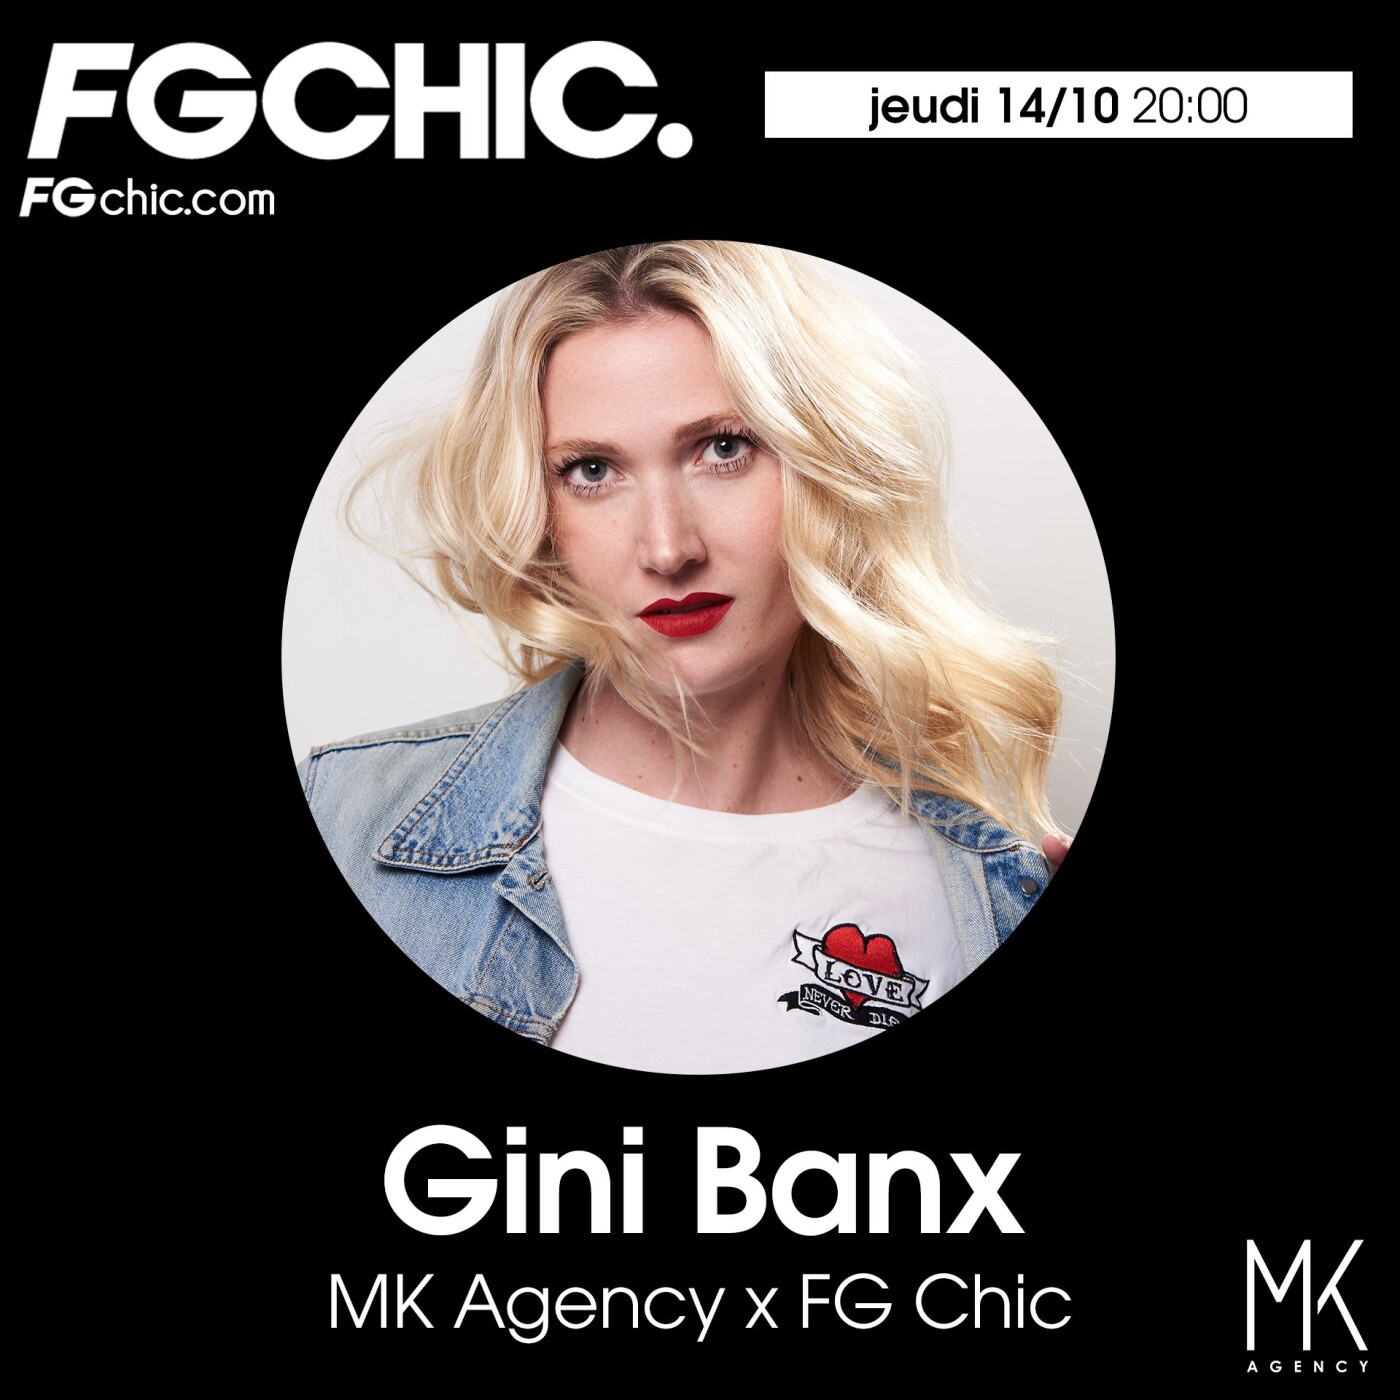 MK AGENCY x FG CHIC BY GINI BANX